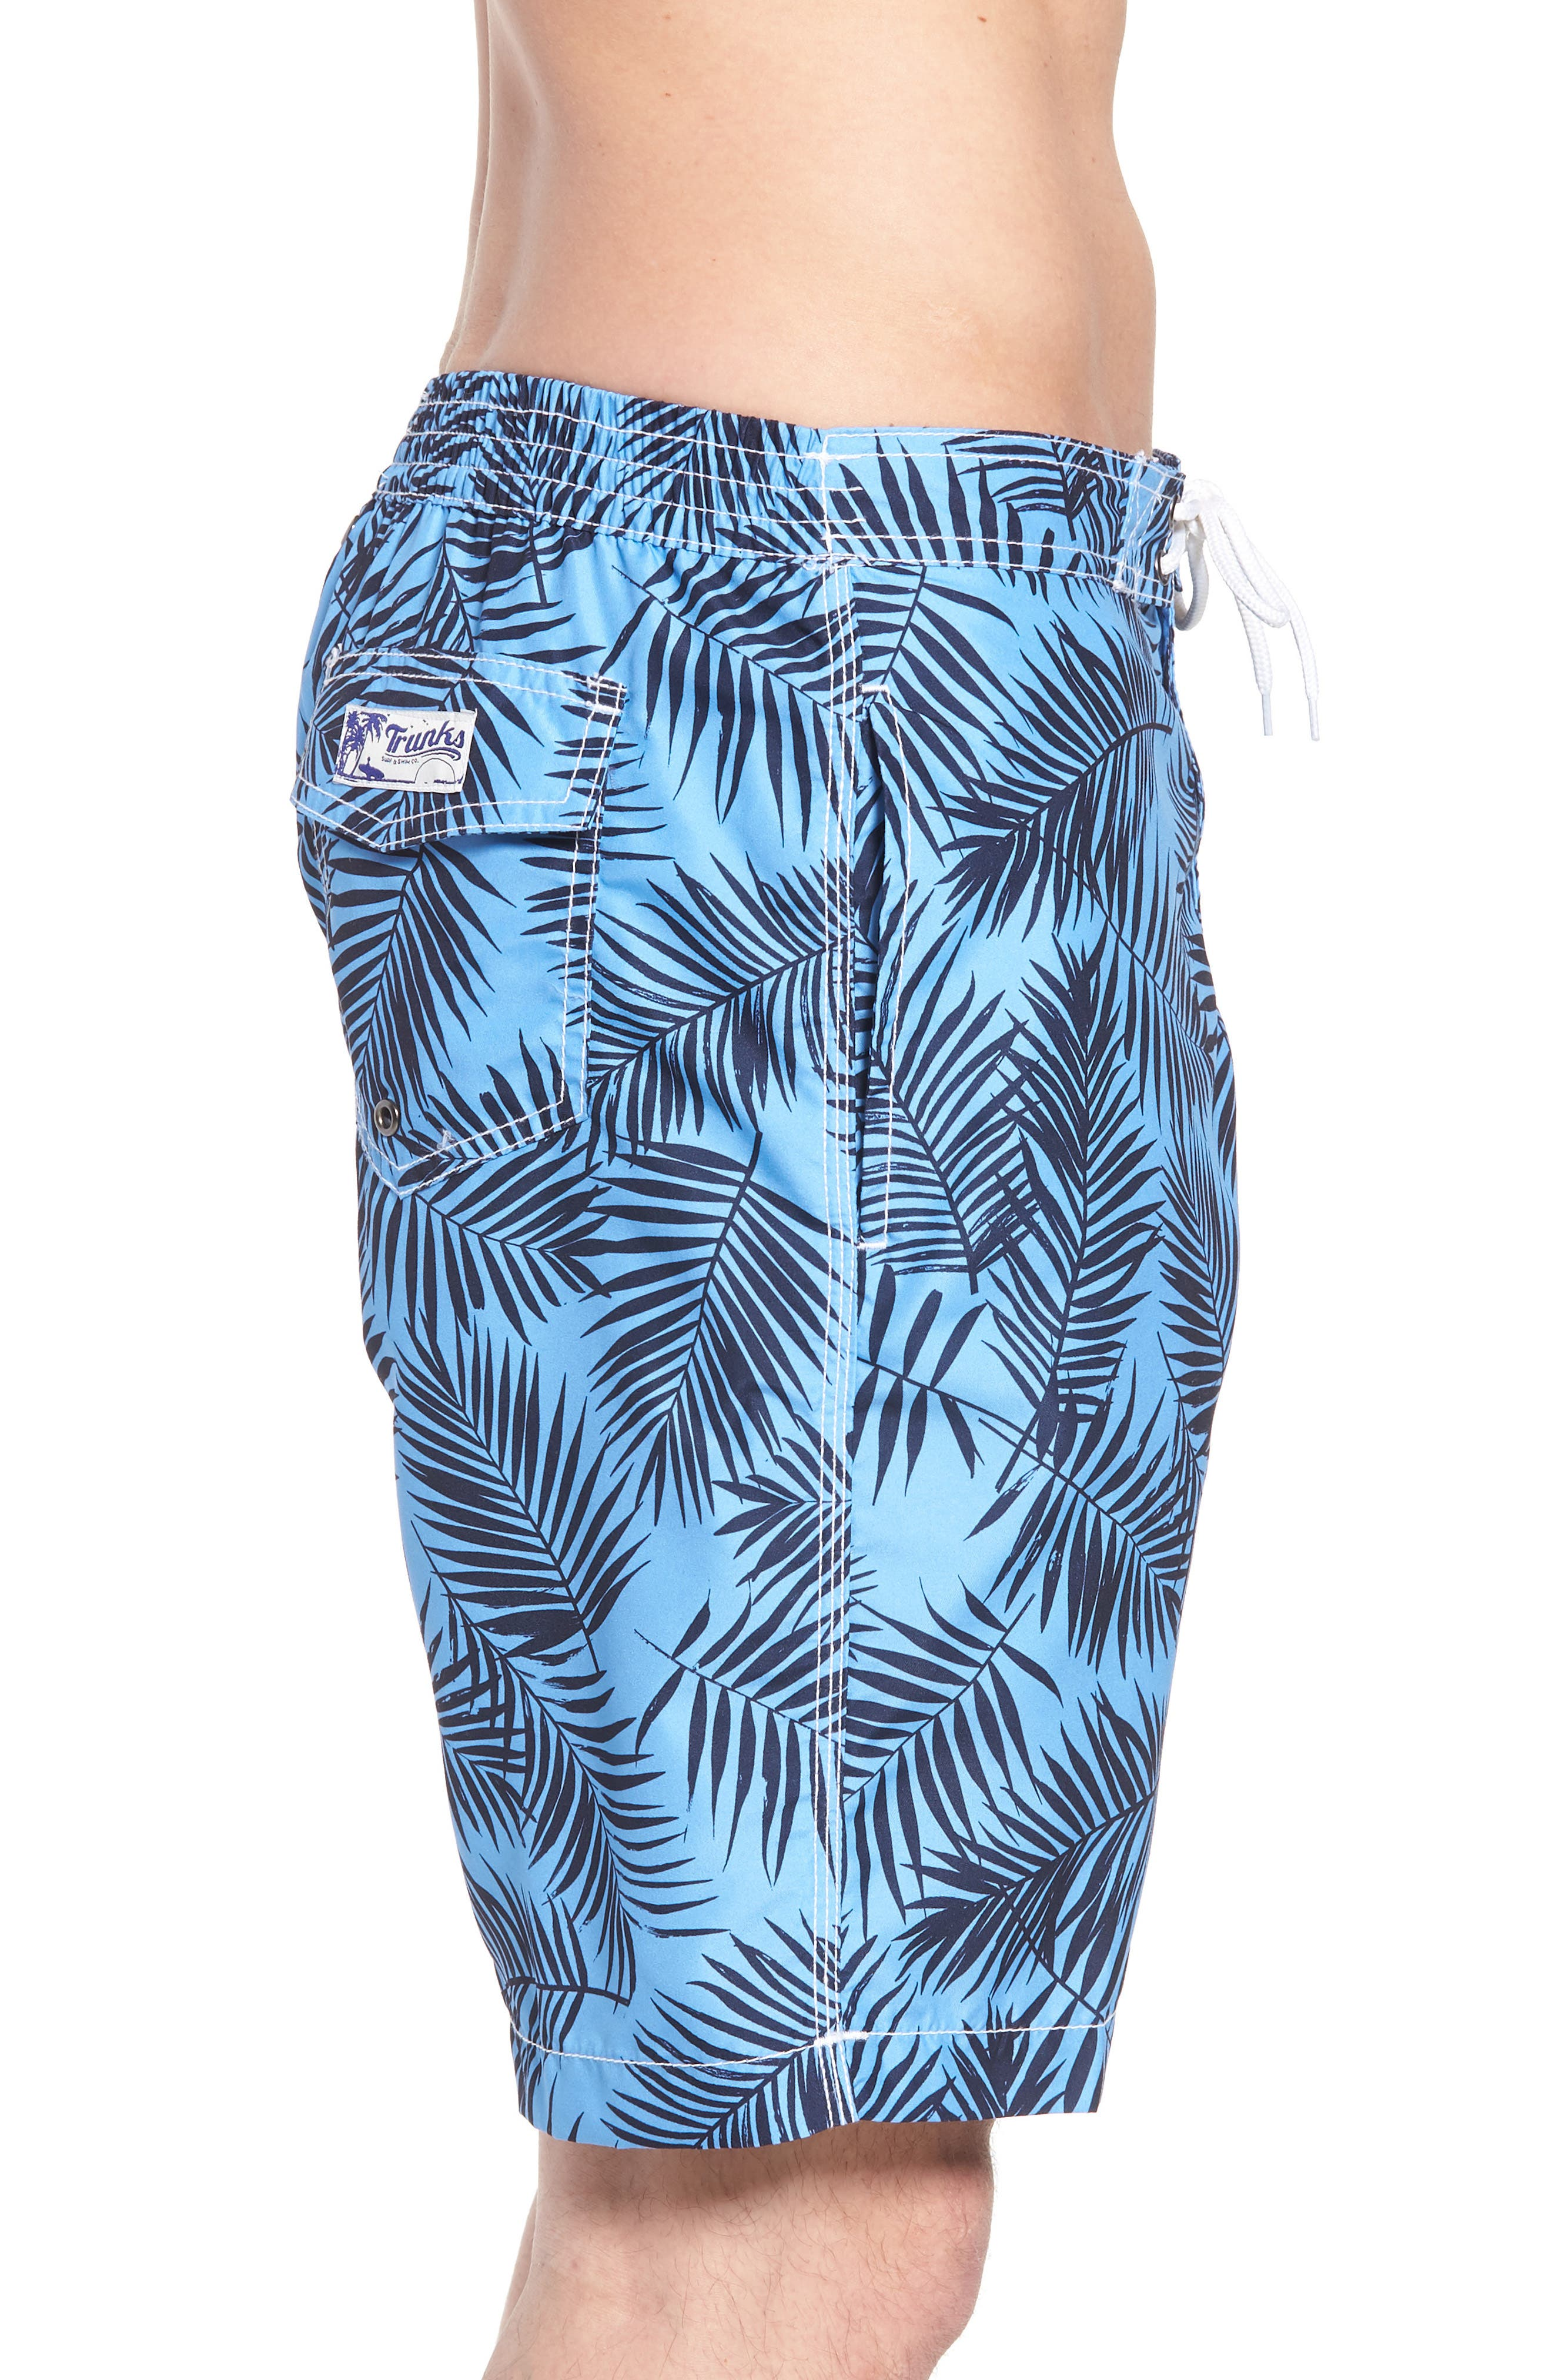 Swami Tropical Island Board Shorts,                             Alternate thumbnail 3, color,                             461